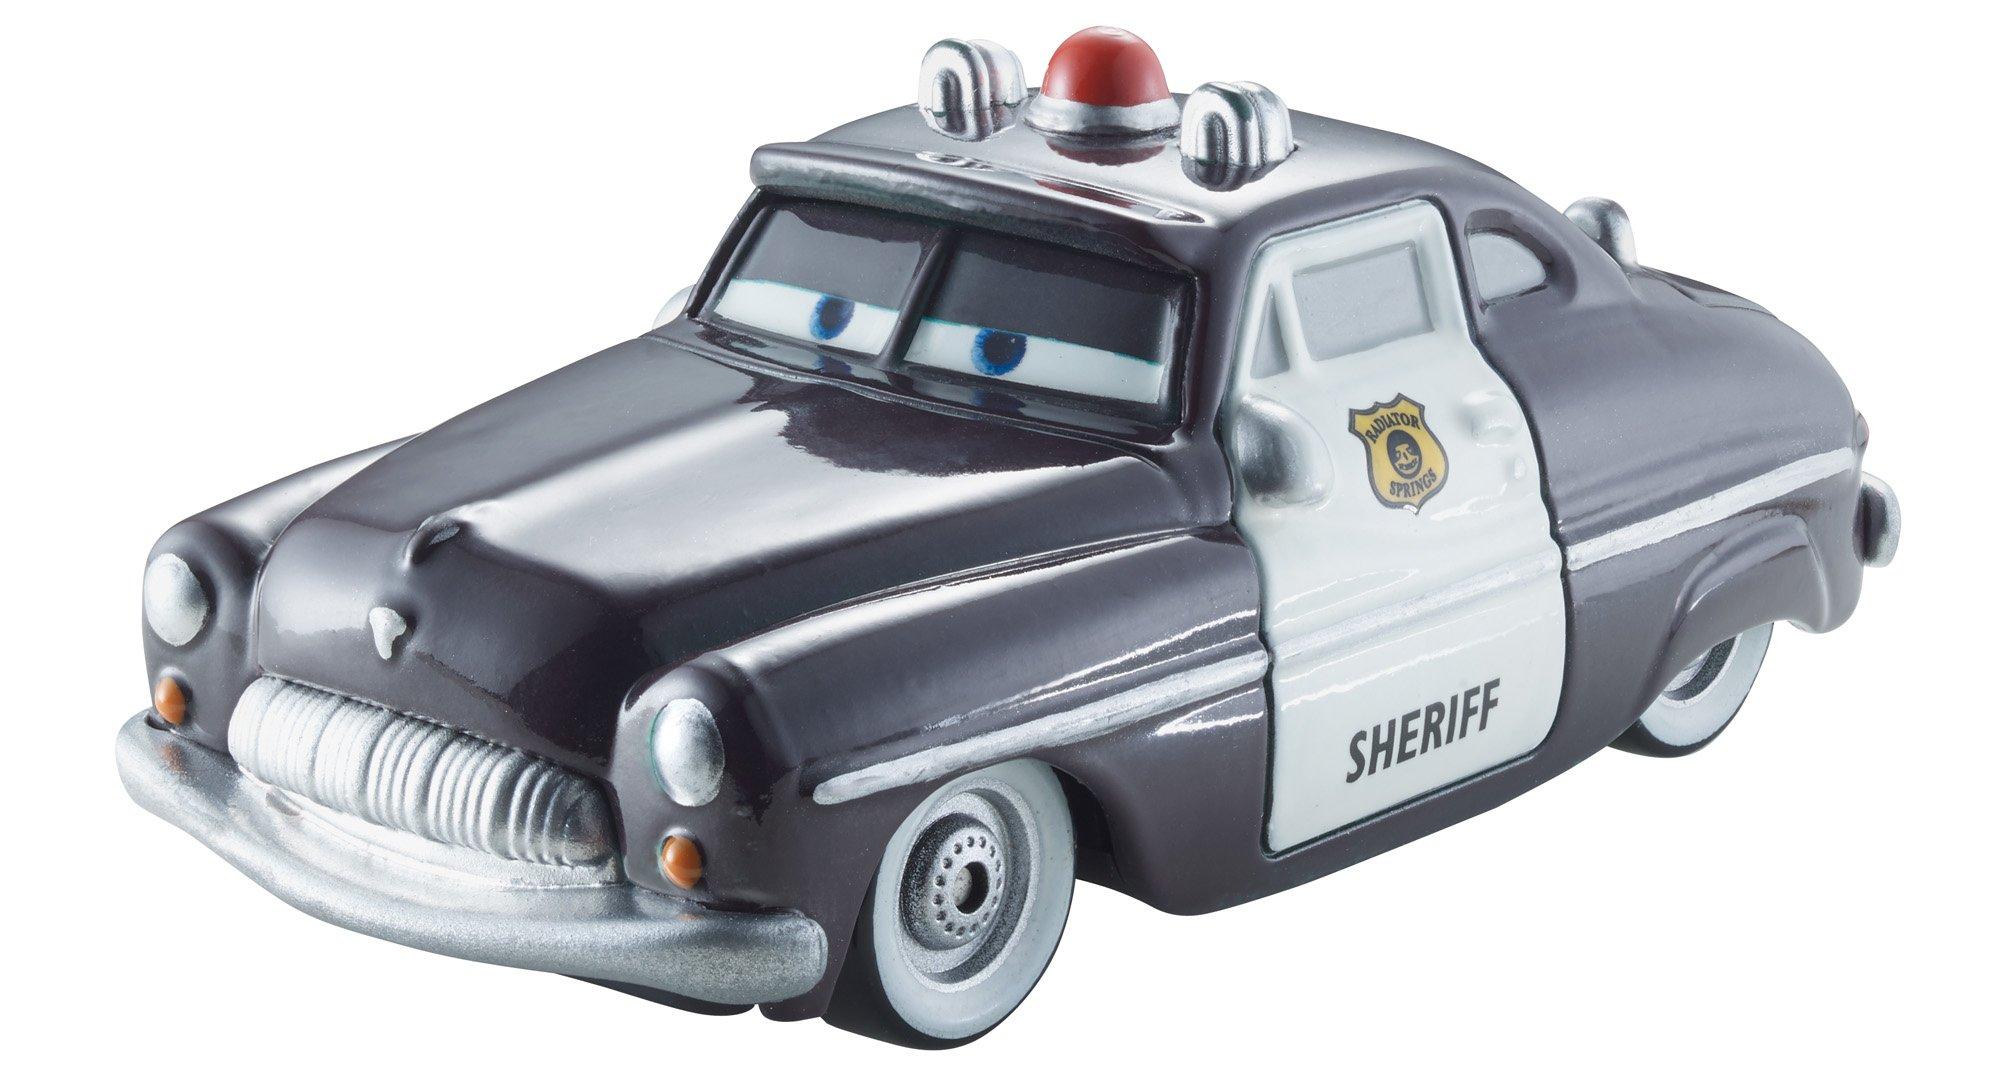 Disney Pixar Cars Color Change 1:55 Scale Vehicle, Sheriff